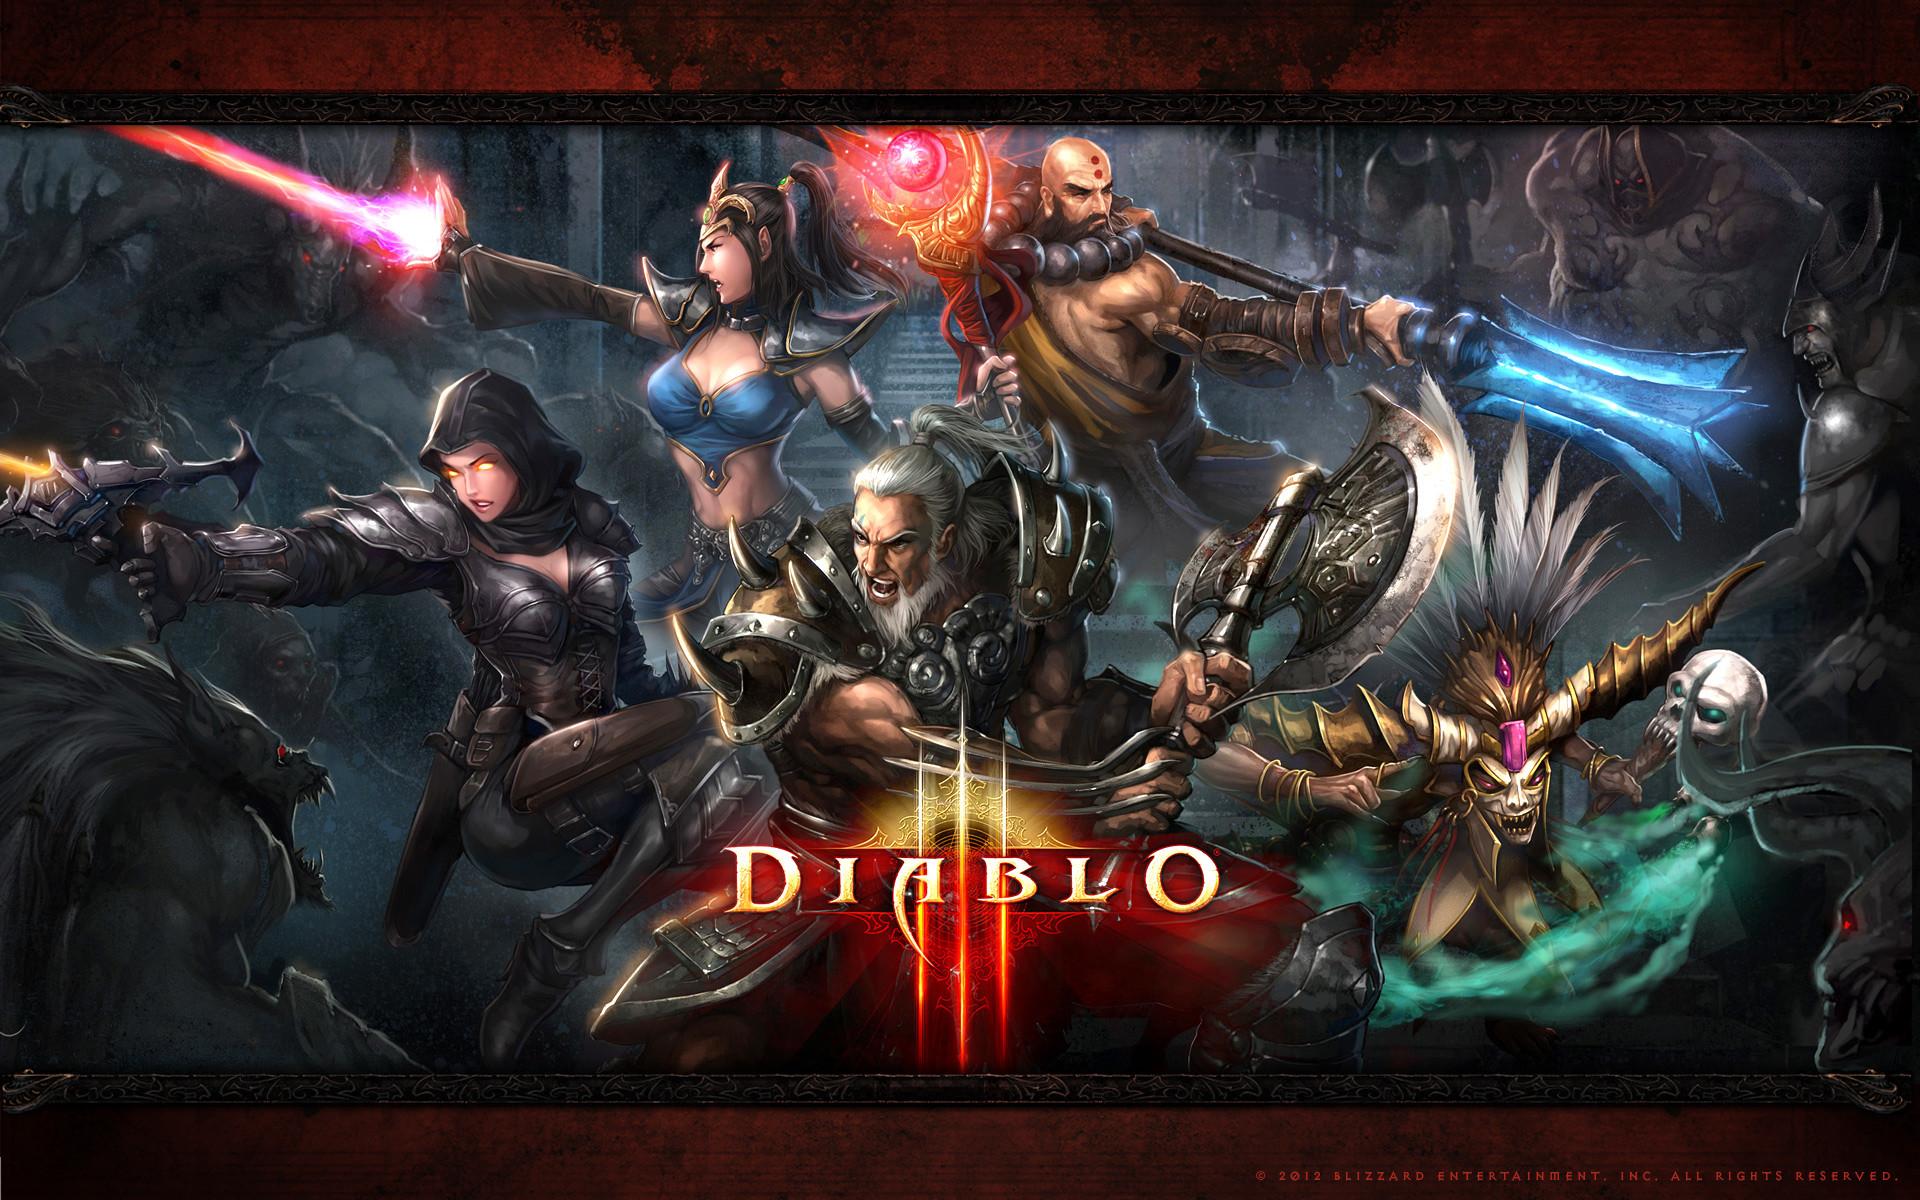 Diablo Single Screen HD desktop wallpaper High Definition Mobile | HD  Wallpapers | Pinterest | Wallpaper and Wallpaper pc